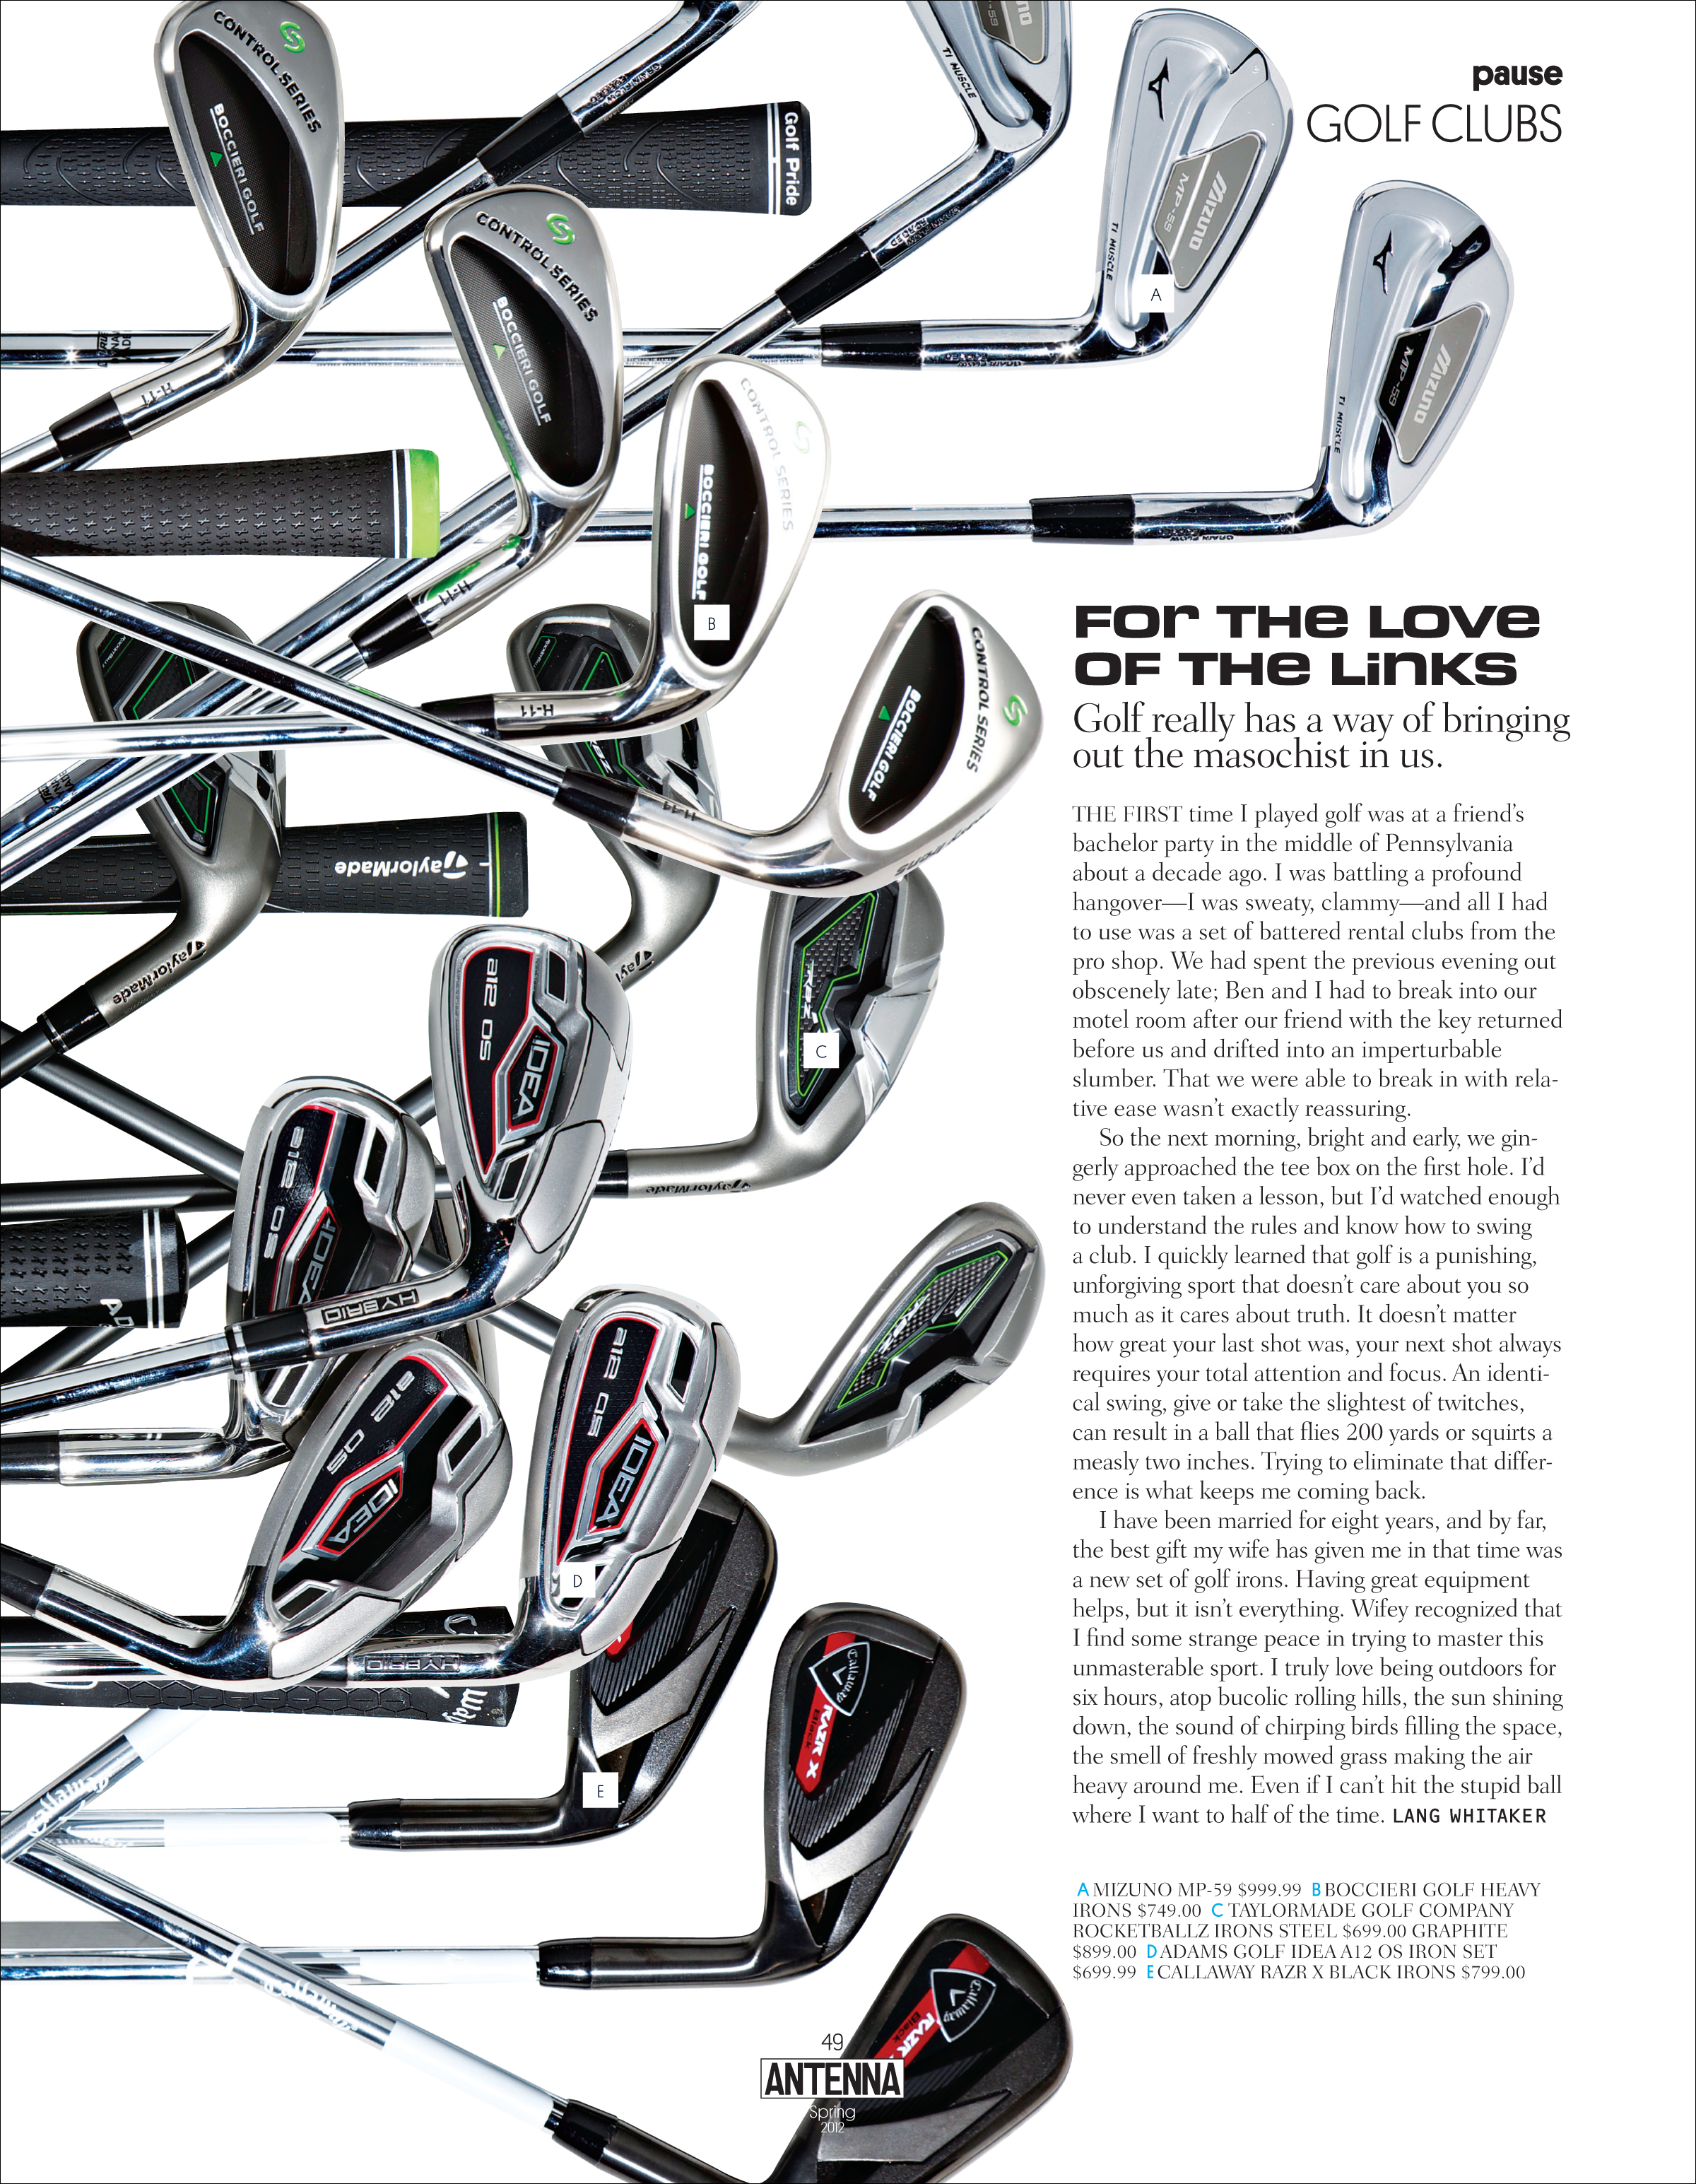 19 g golf clubs.jpg